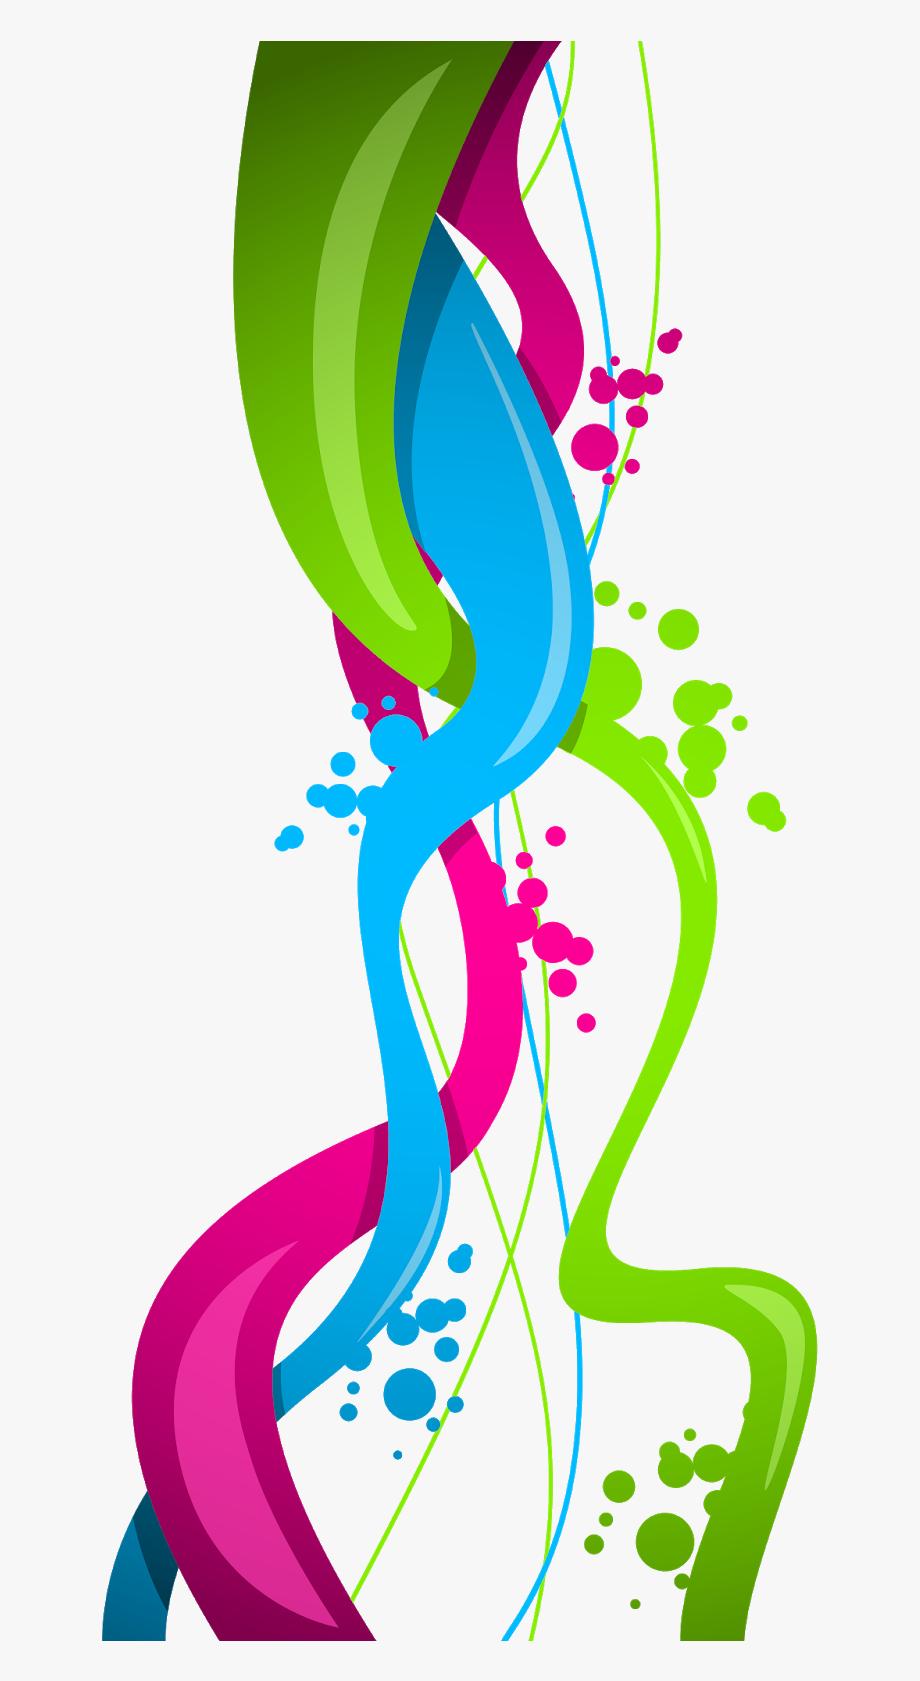 graphic designs free download.